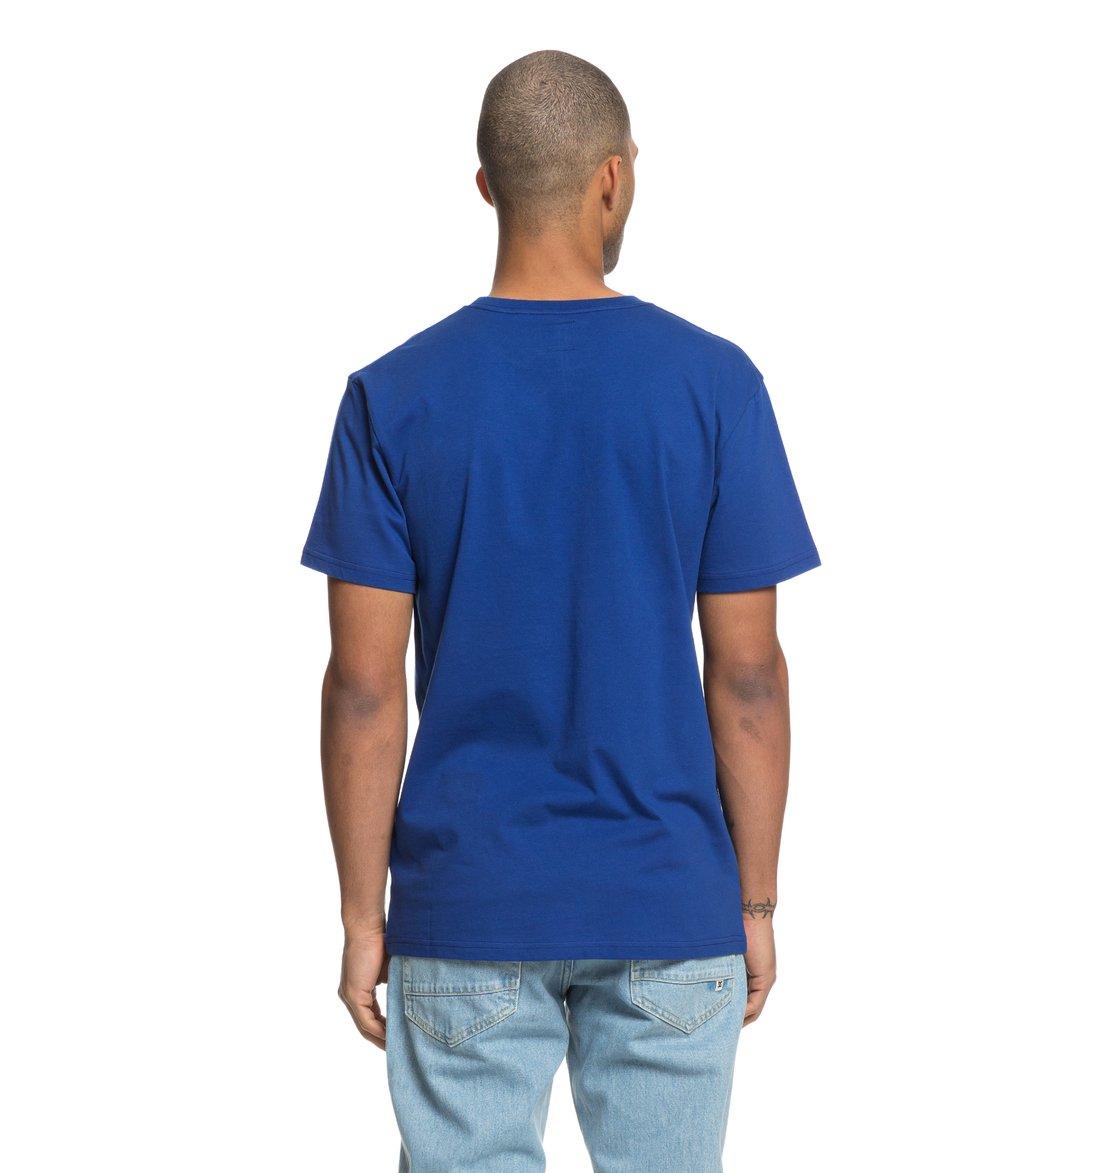 Dc Sodalite Blau Square Star Kapuzenpullover Sport-kapuzenpullis & -sweatshirts Fitnessmode